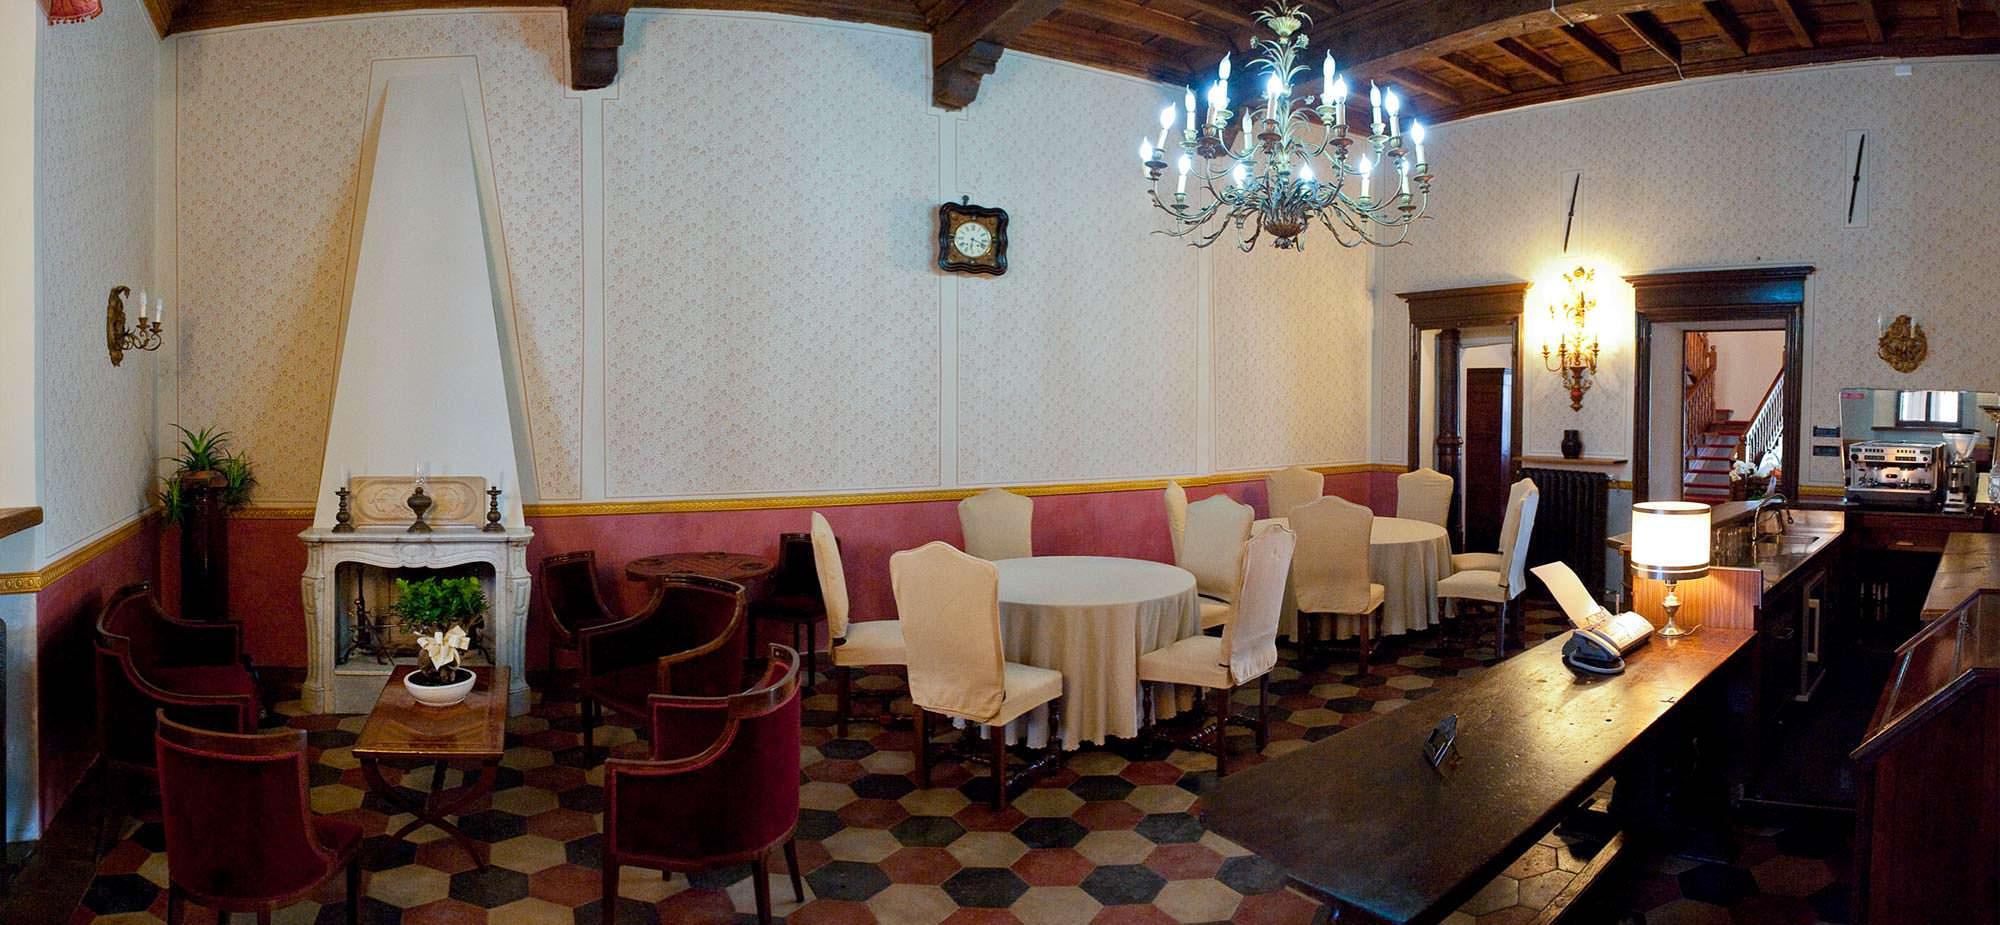 ristorante , antico , monastero , cucina , sala